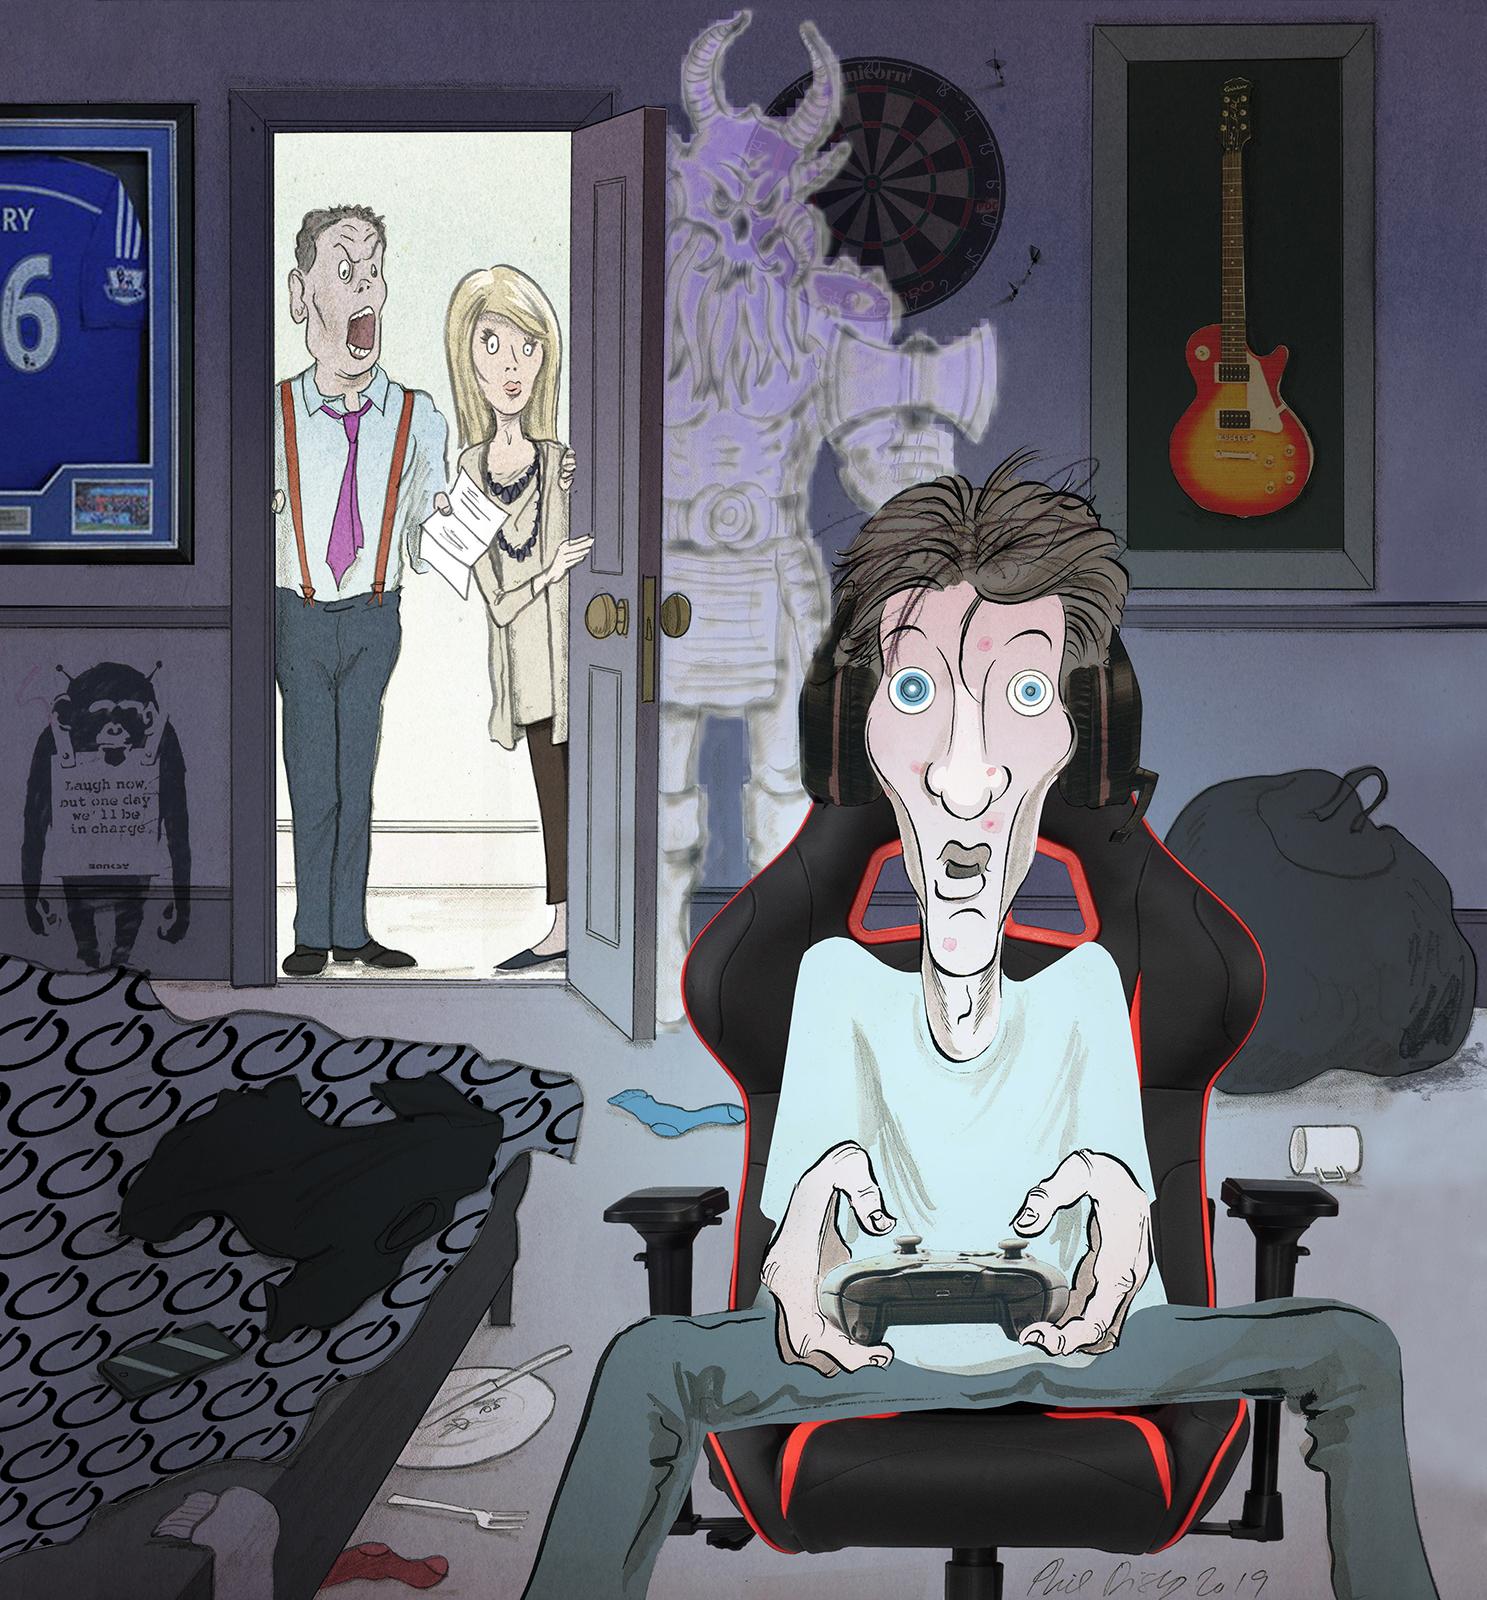 Phil Disley / Gaming Addict / Financial Times